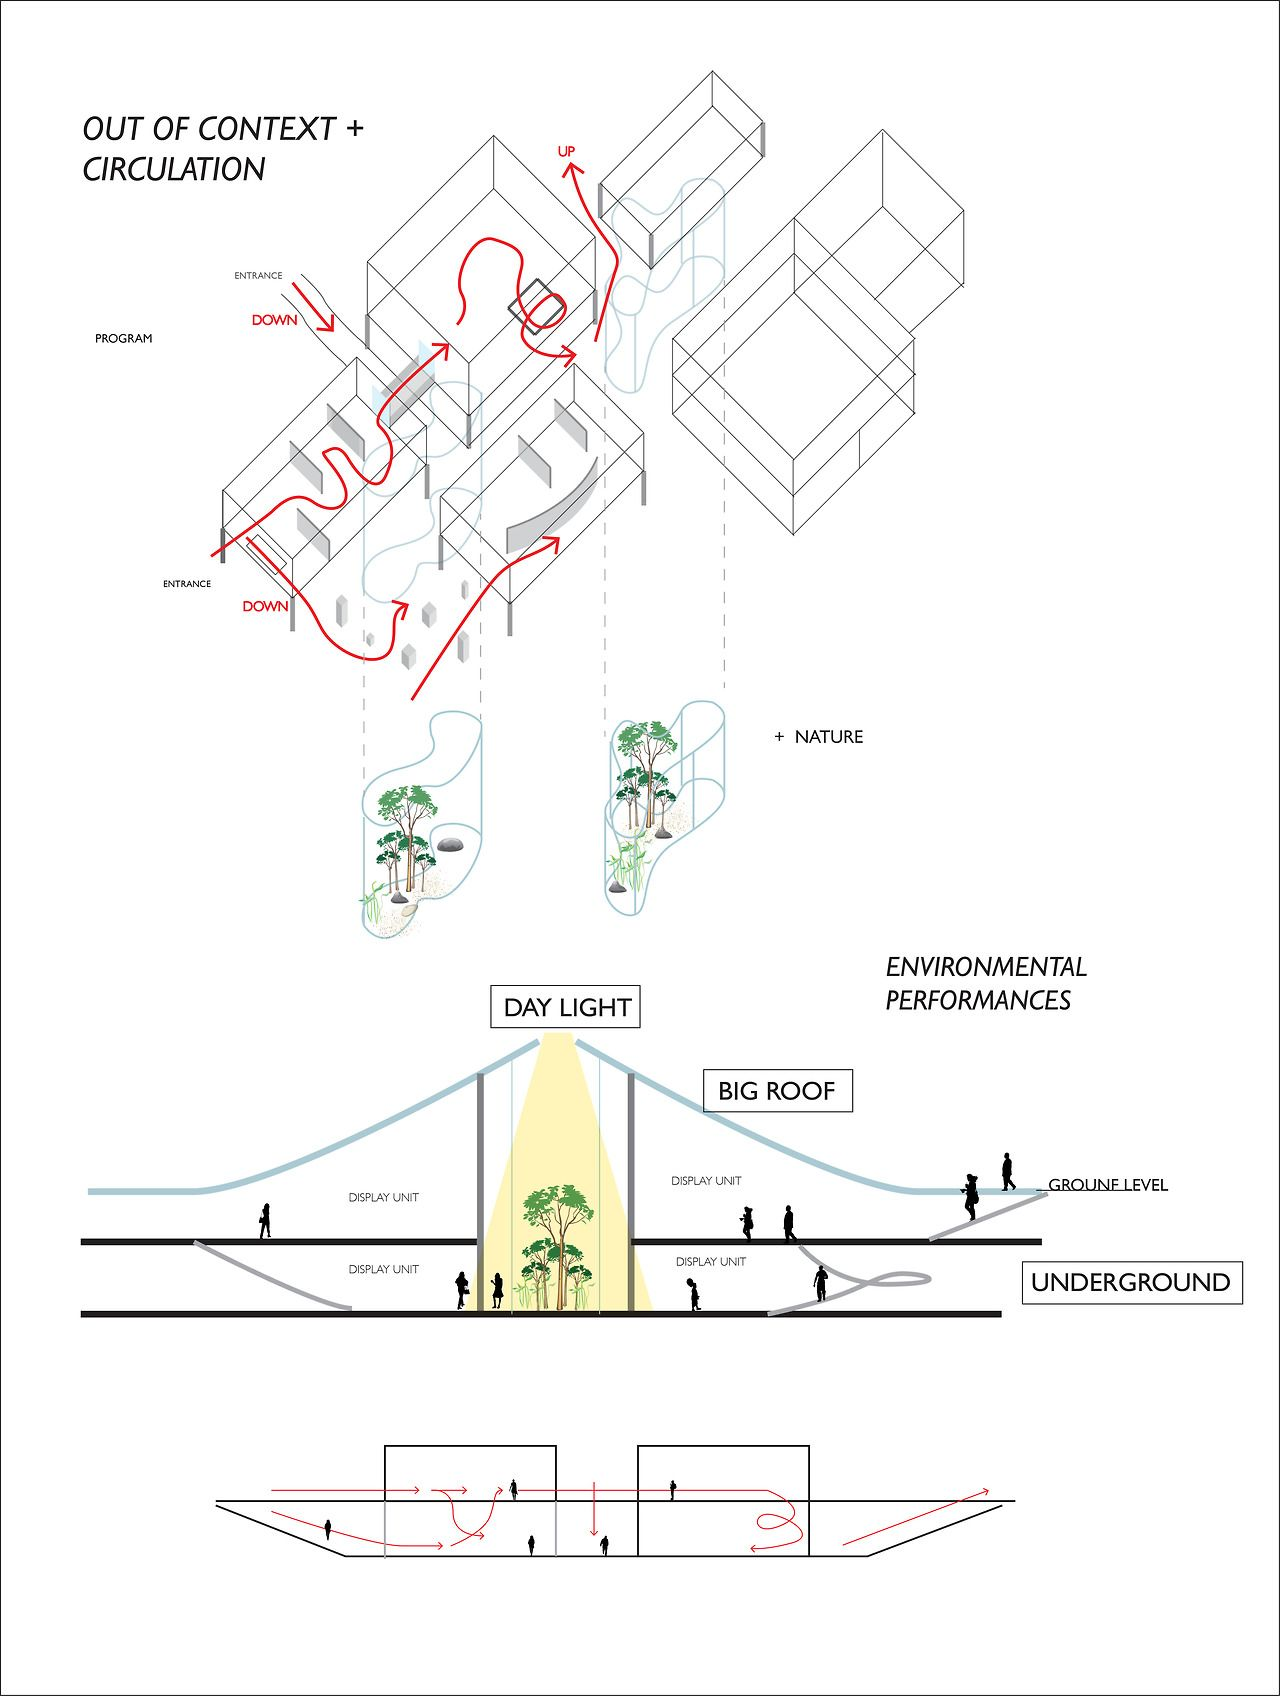 medium resolution of chacha chanya niyomsith 5434726425 section and circulation diagram illustrating the environmental performances and circulation